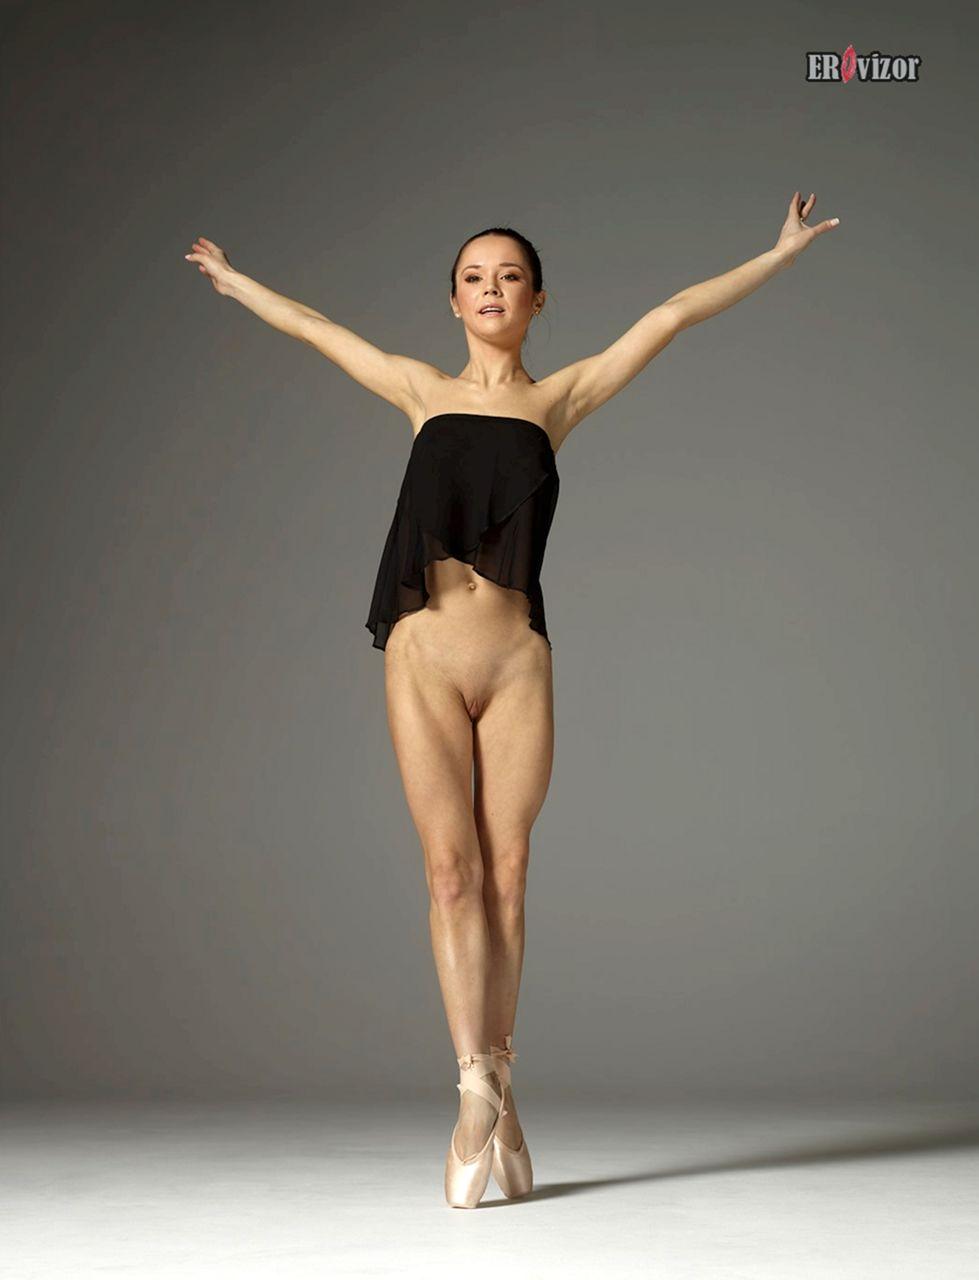 magdalena-bare-ballet-erptoca-11